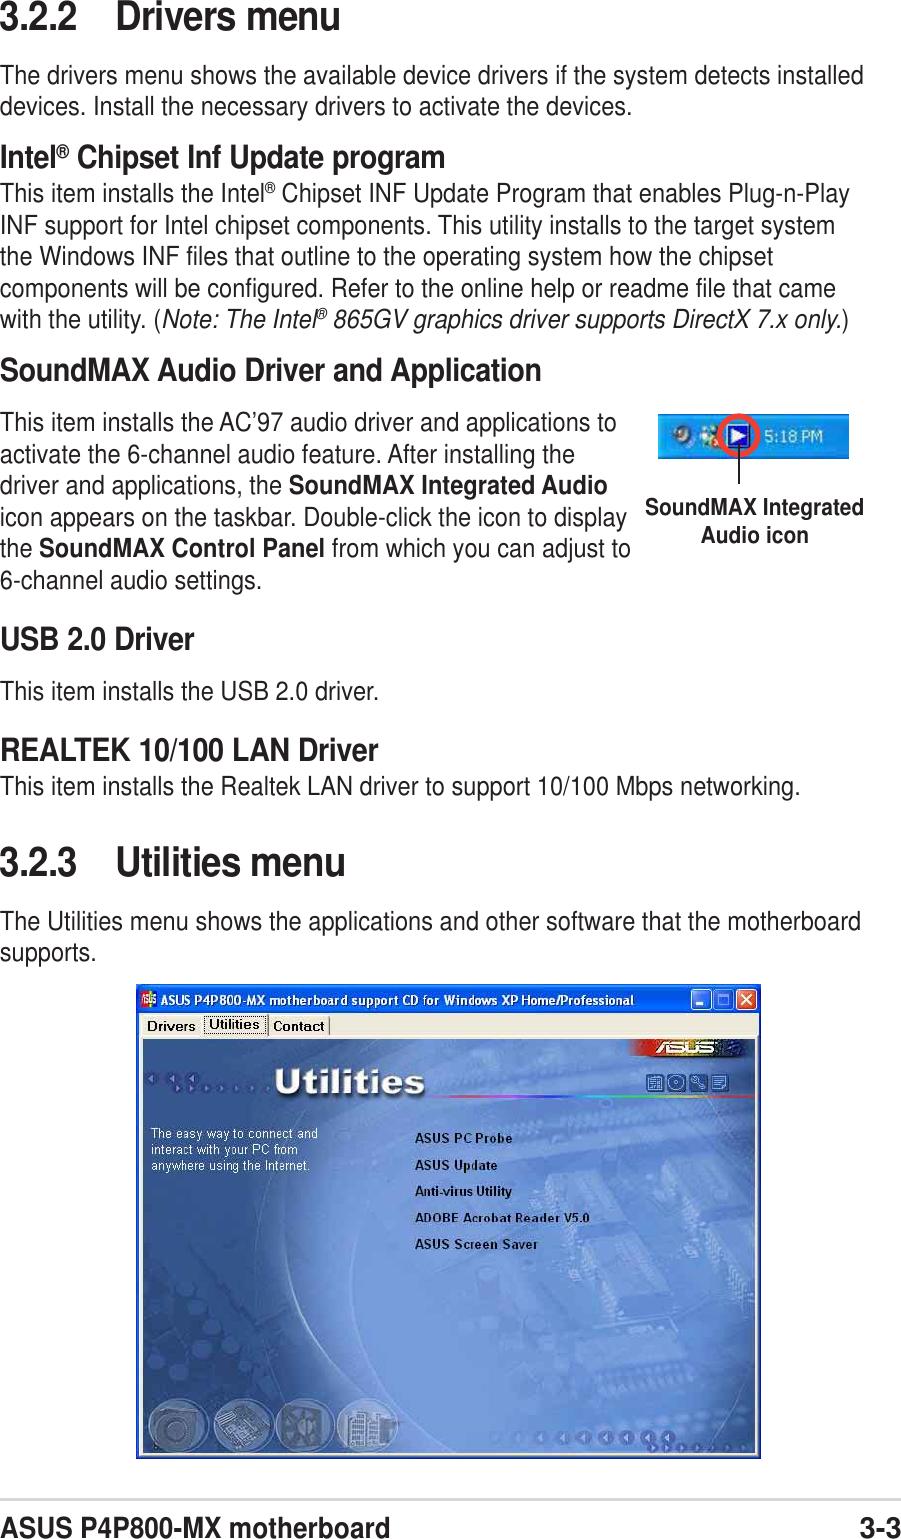 Asus P4P800 Mx Users Manual FRONT P65